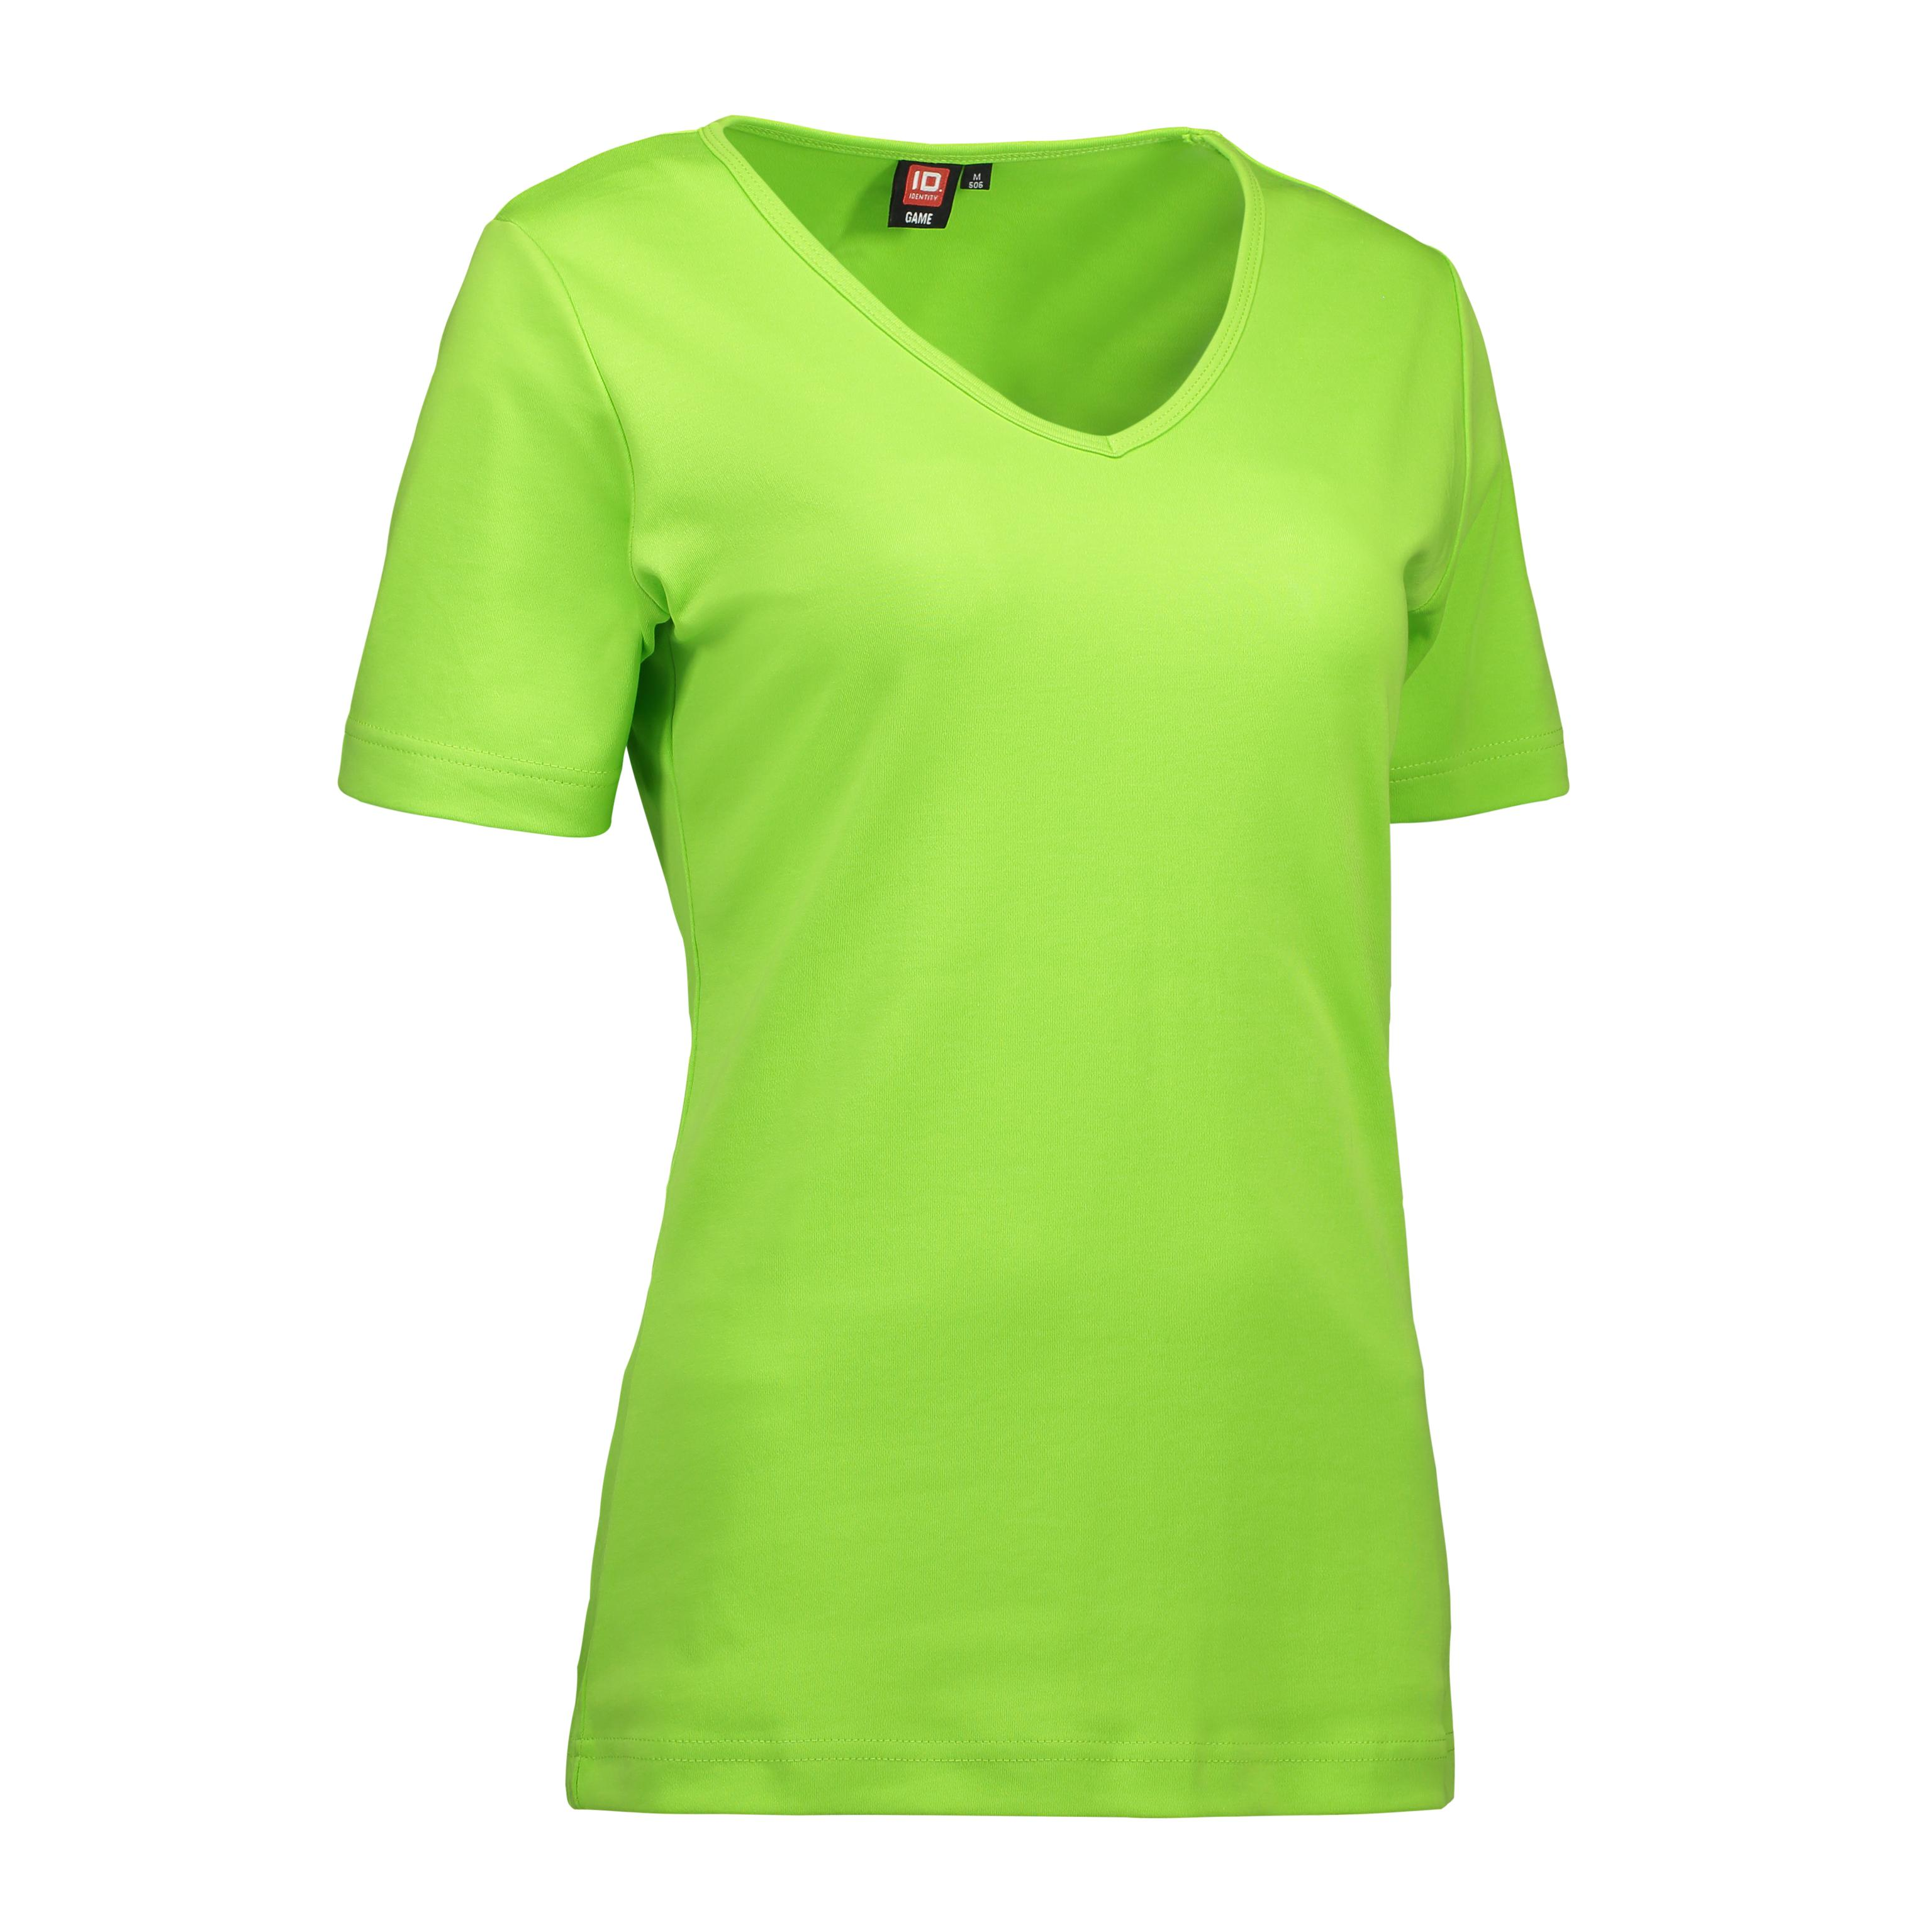 ID Interlock dame T shirt| v hals 0506